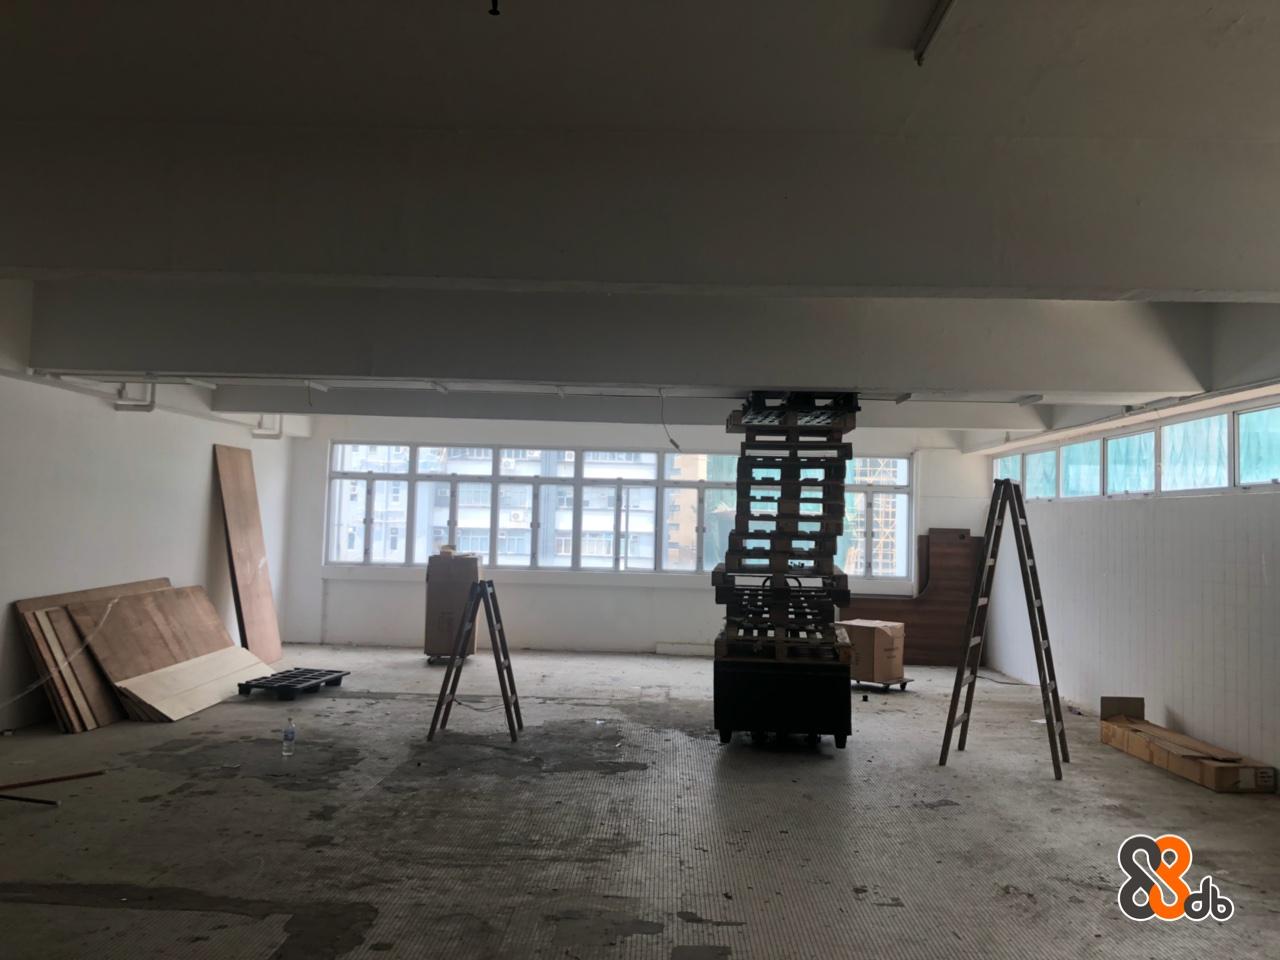 Ceiling,Floor,Property,Building,Room